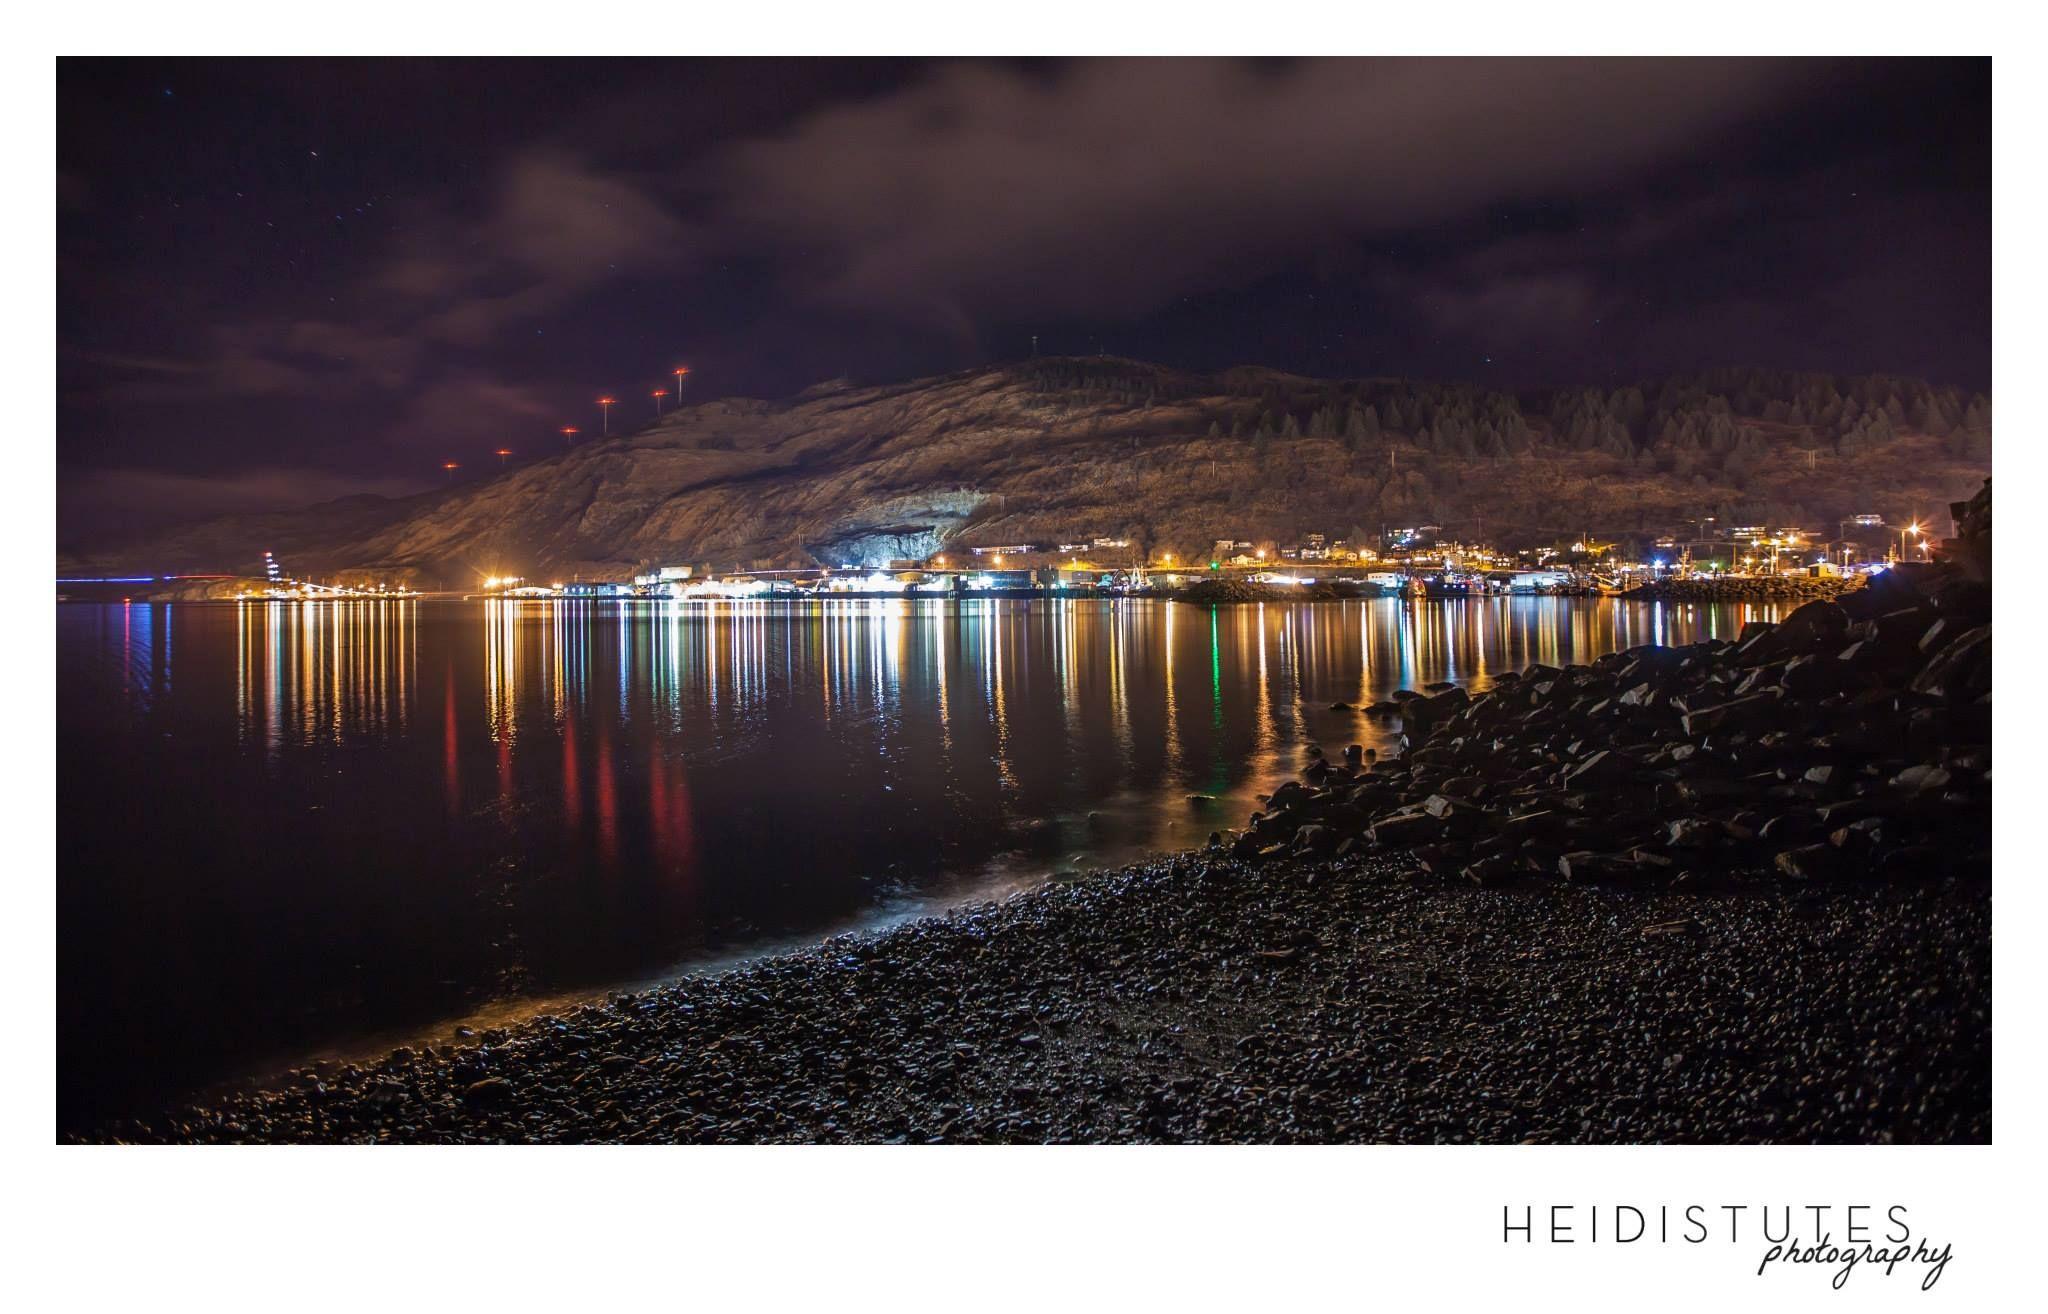 Kodiak, Alaska. By Heidi Stutes Photography. Scenery